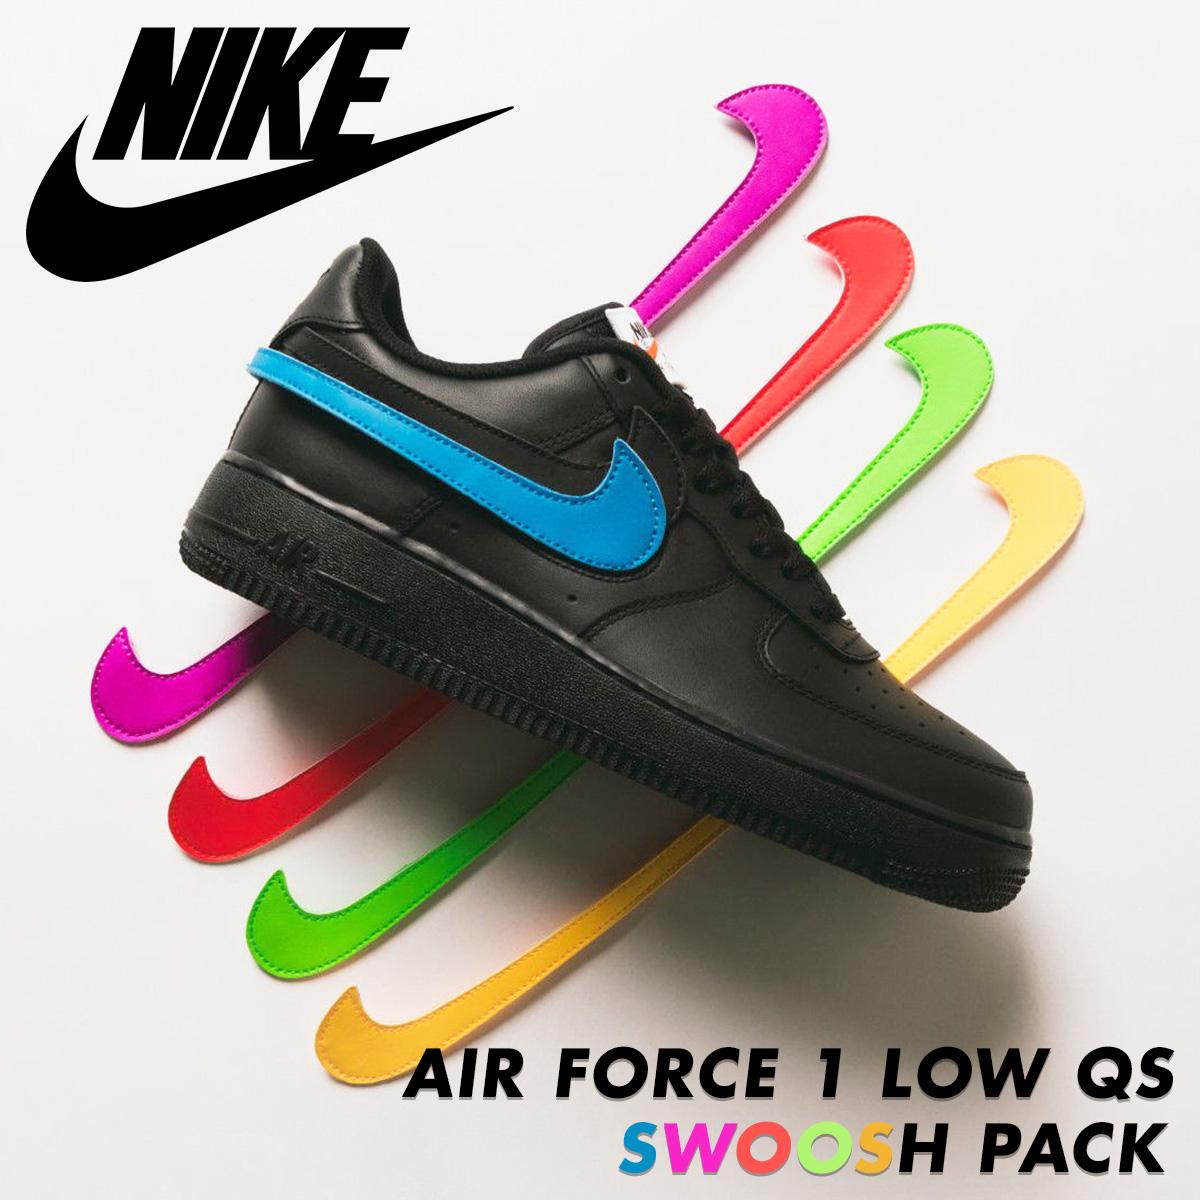 air force 1 swoosh pack italia